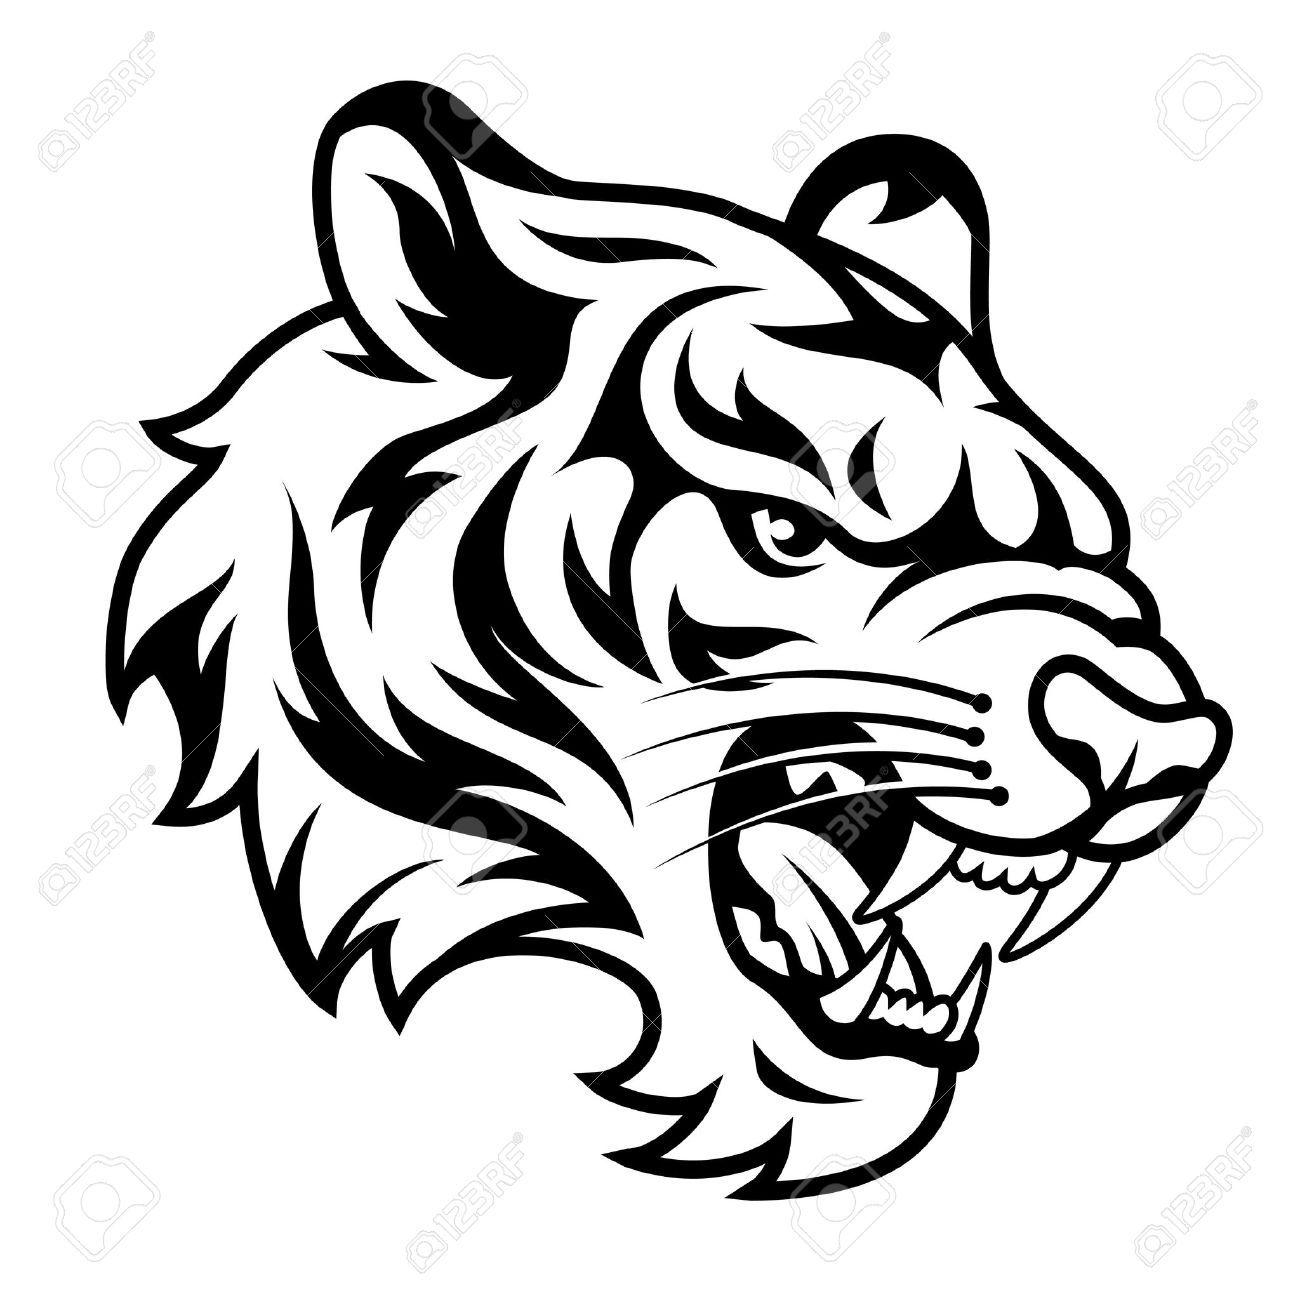 Tiger head clipart black and white 9 » Clipart Portal.